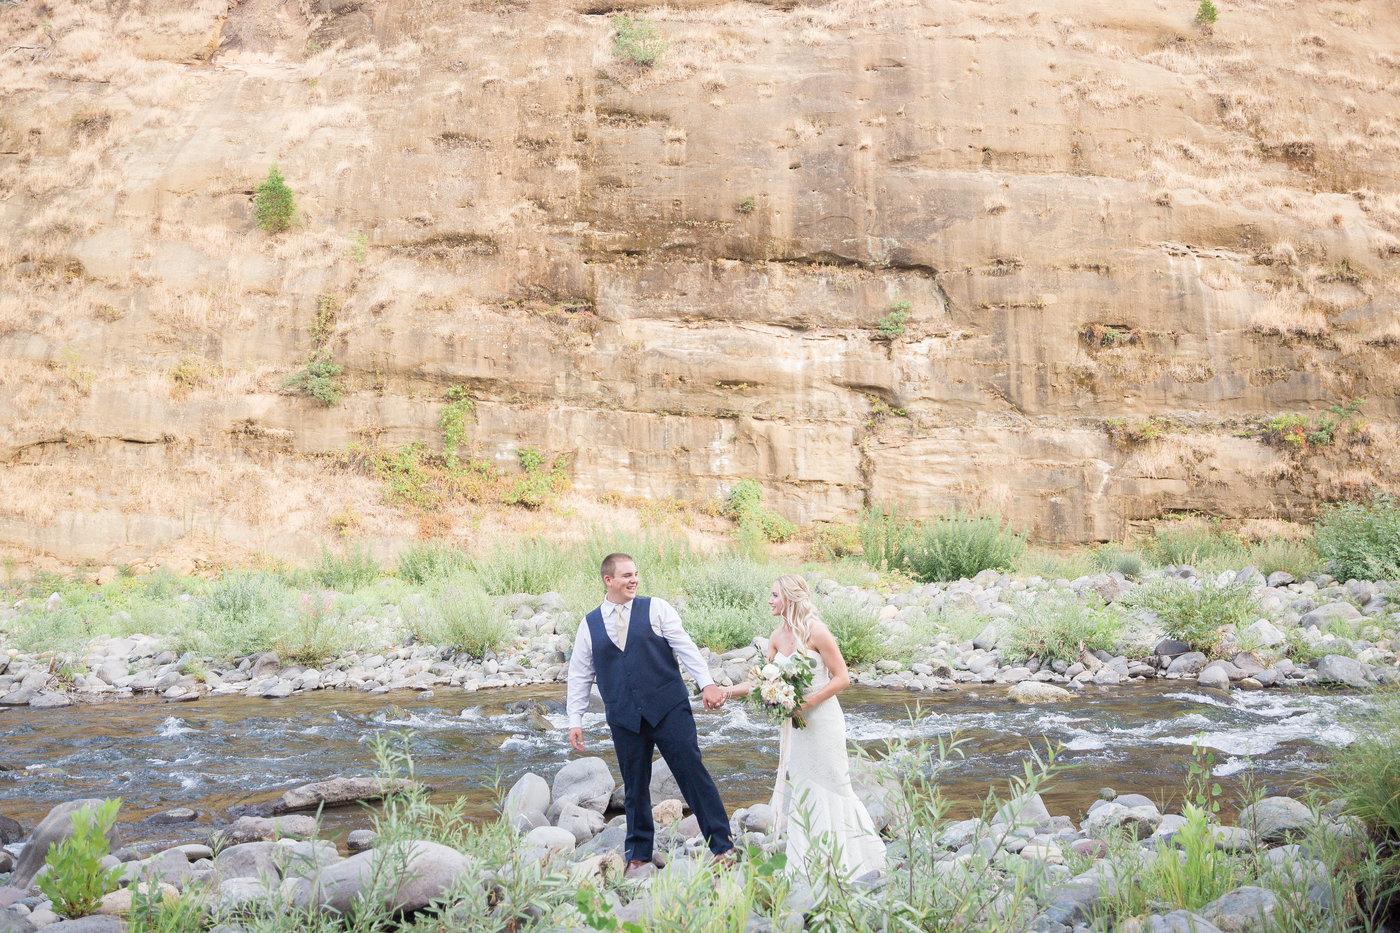 best-wedding-photographer-in-northern-california.jpg